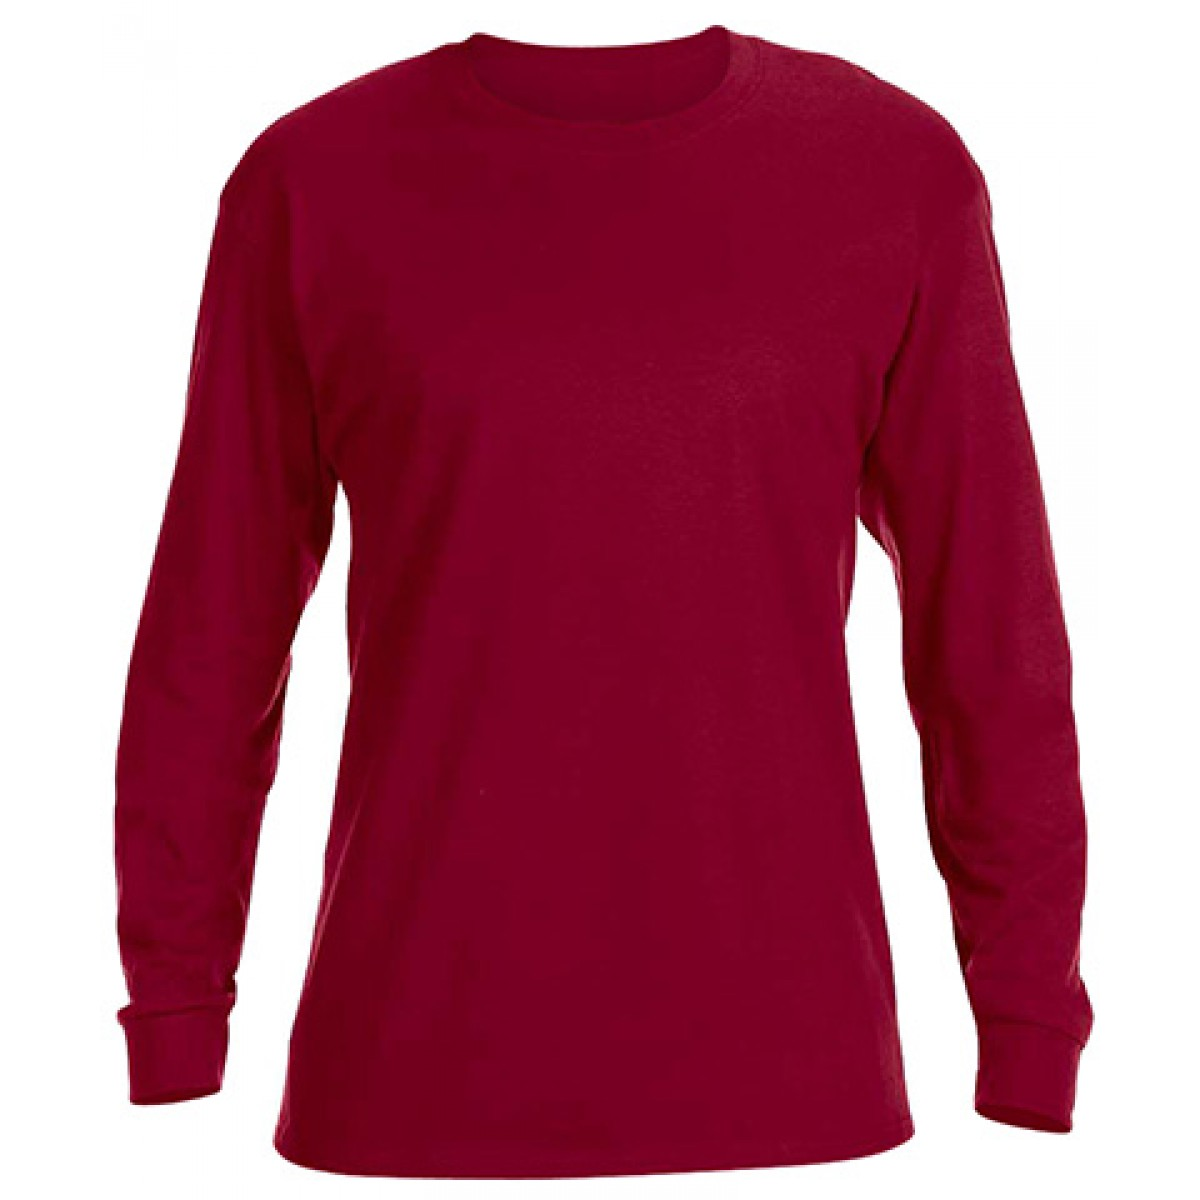 Basic Long Sleeve Crew Neck -Cardinal Red-XL